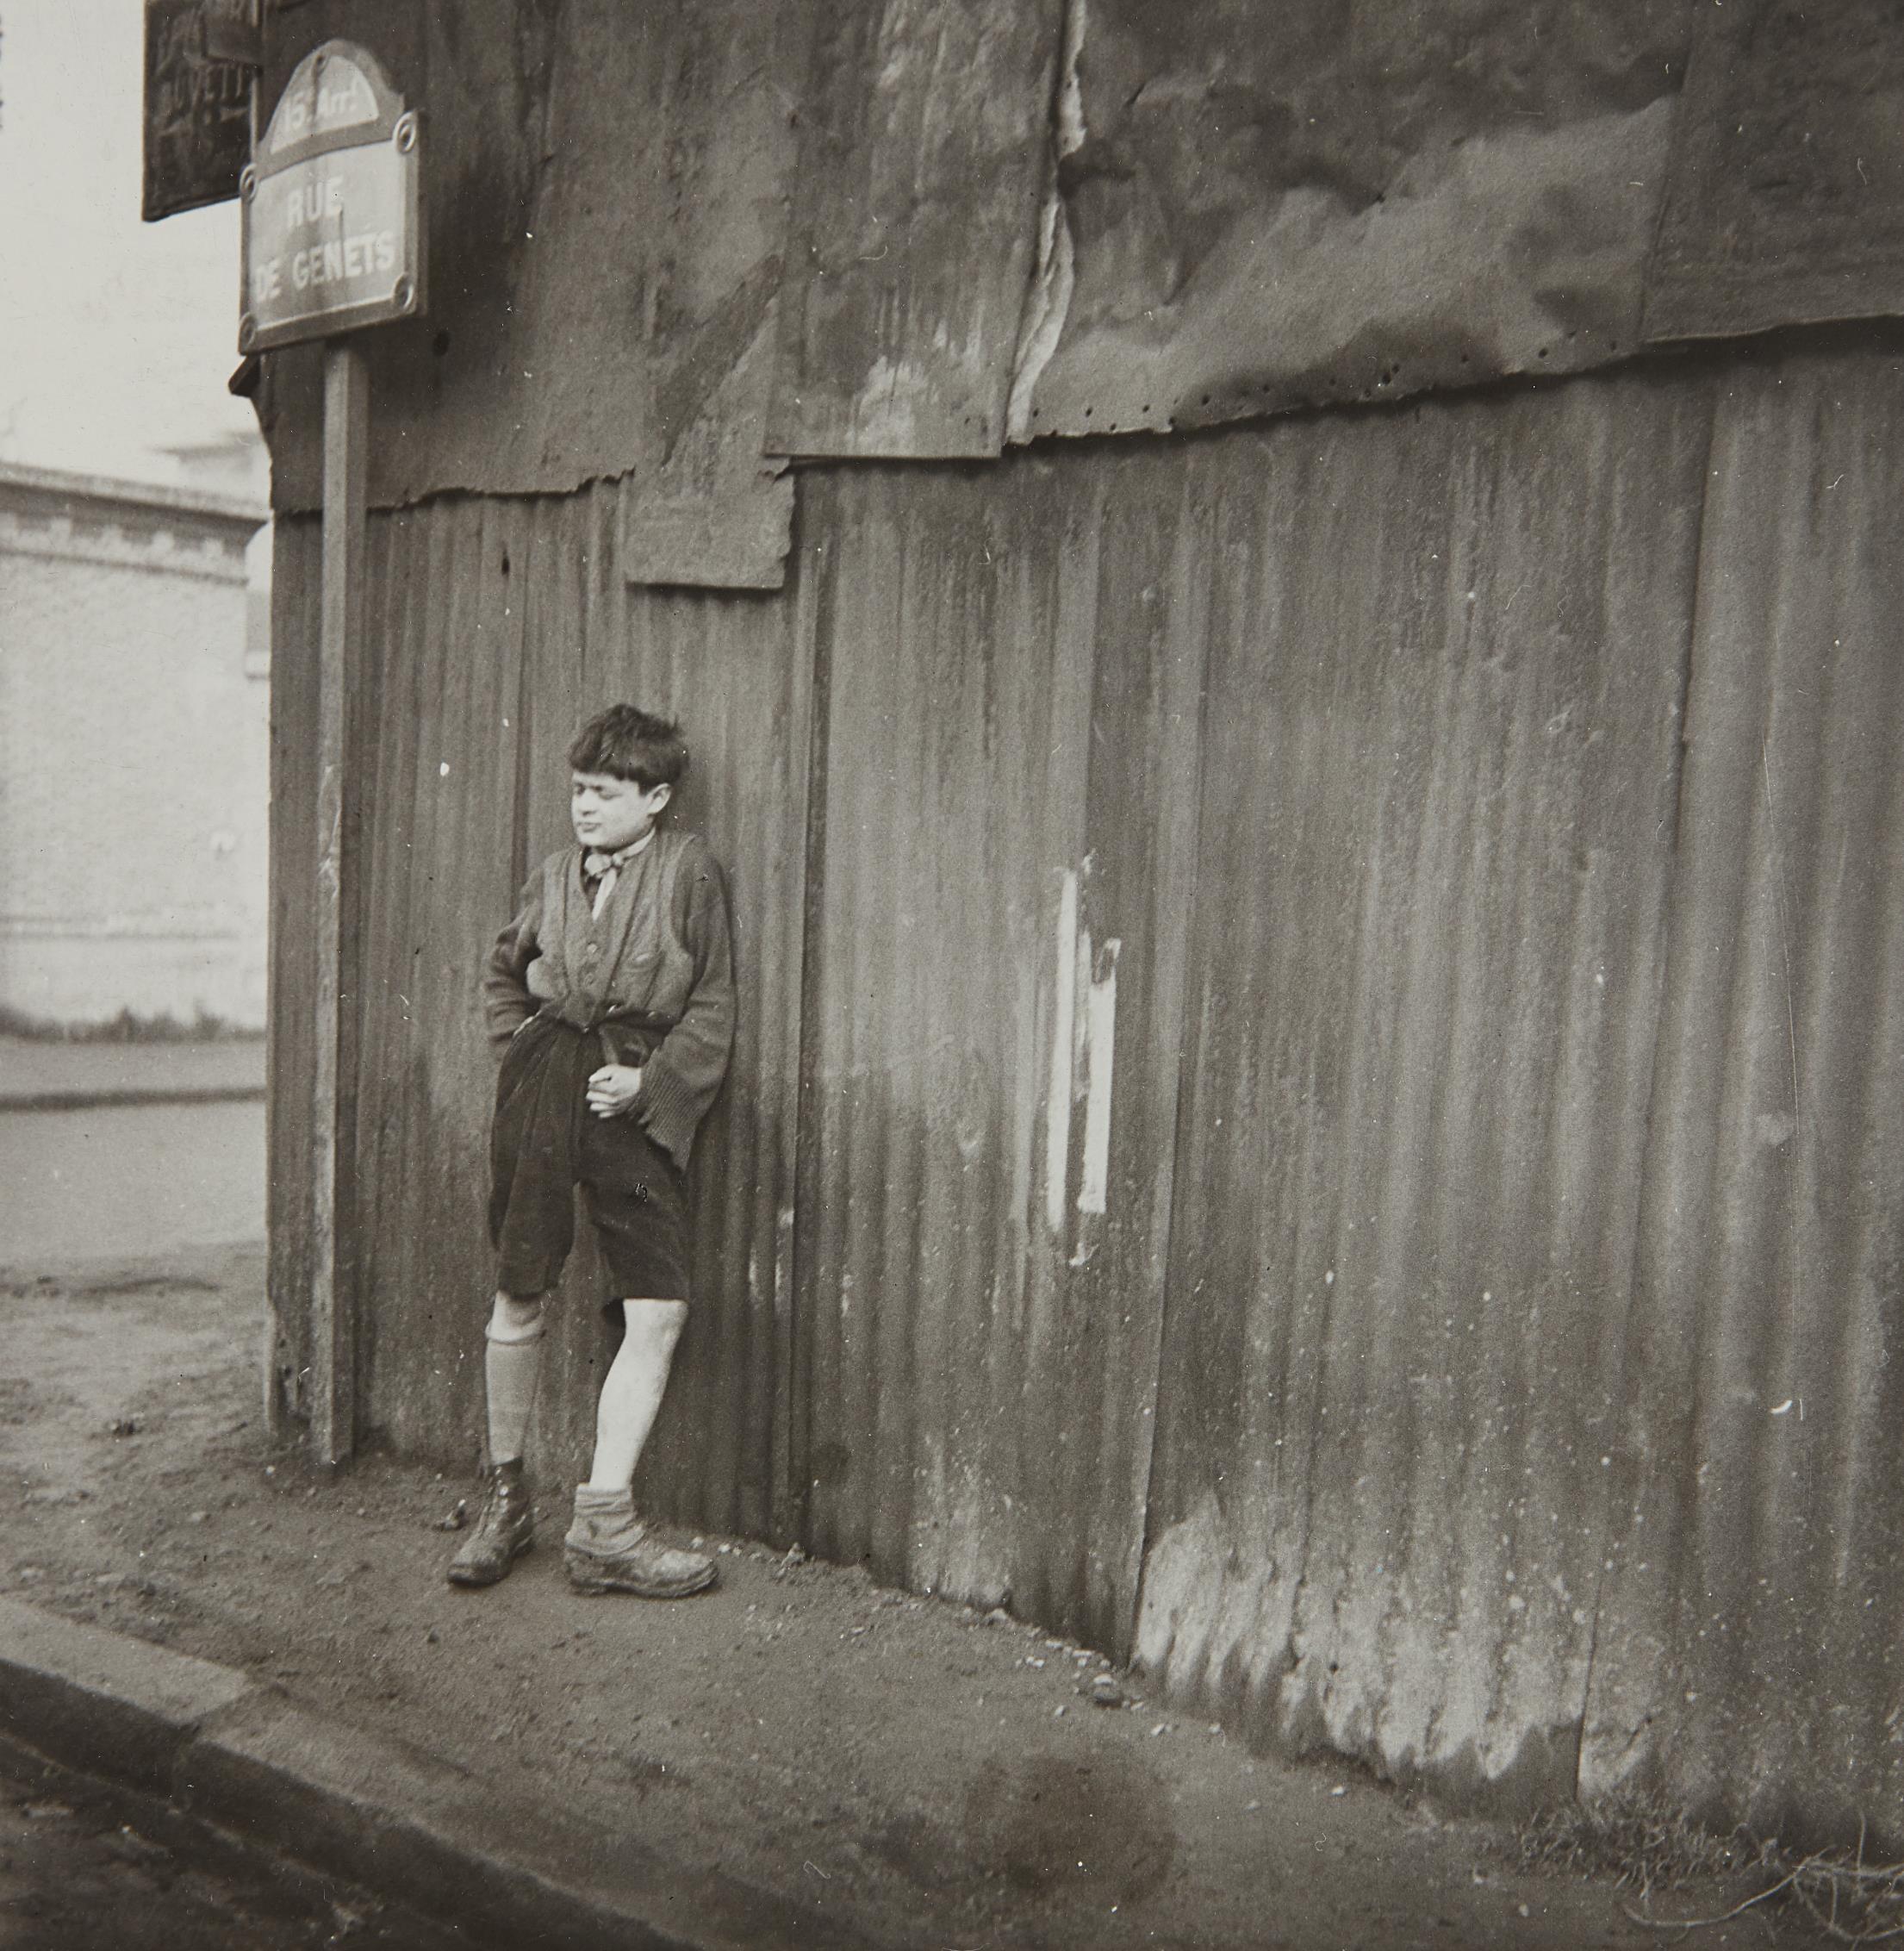 Dora Maar-Gamin aux Chaussures Depareilles-1933